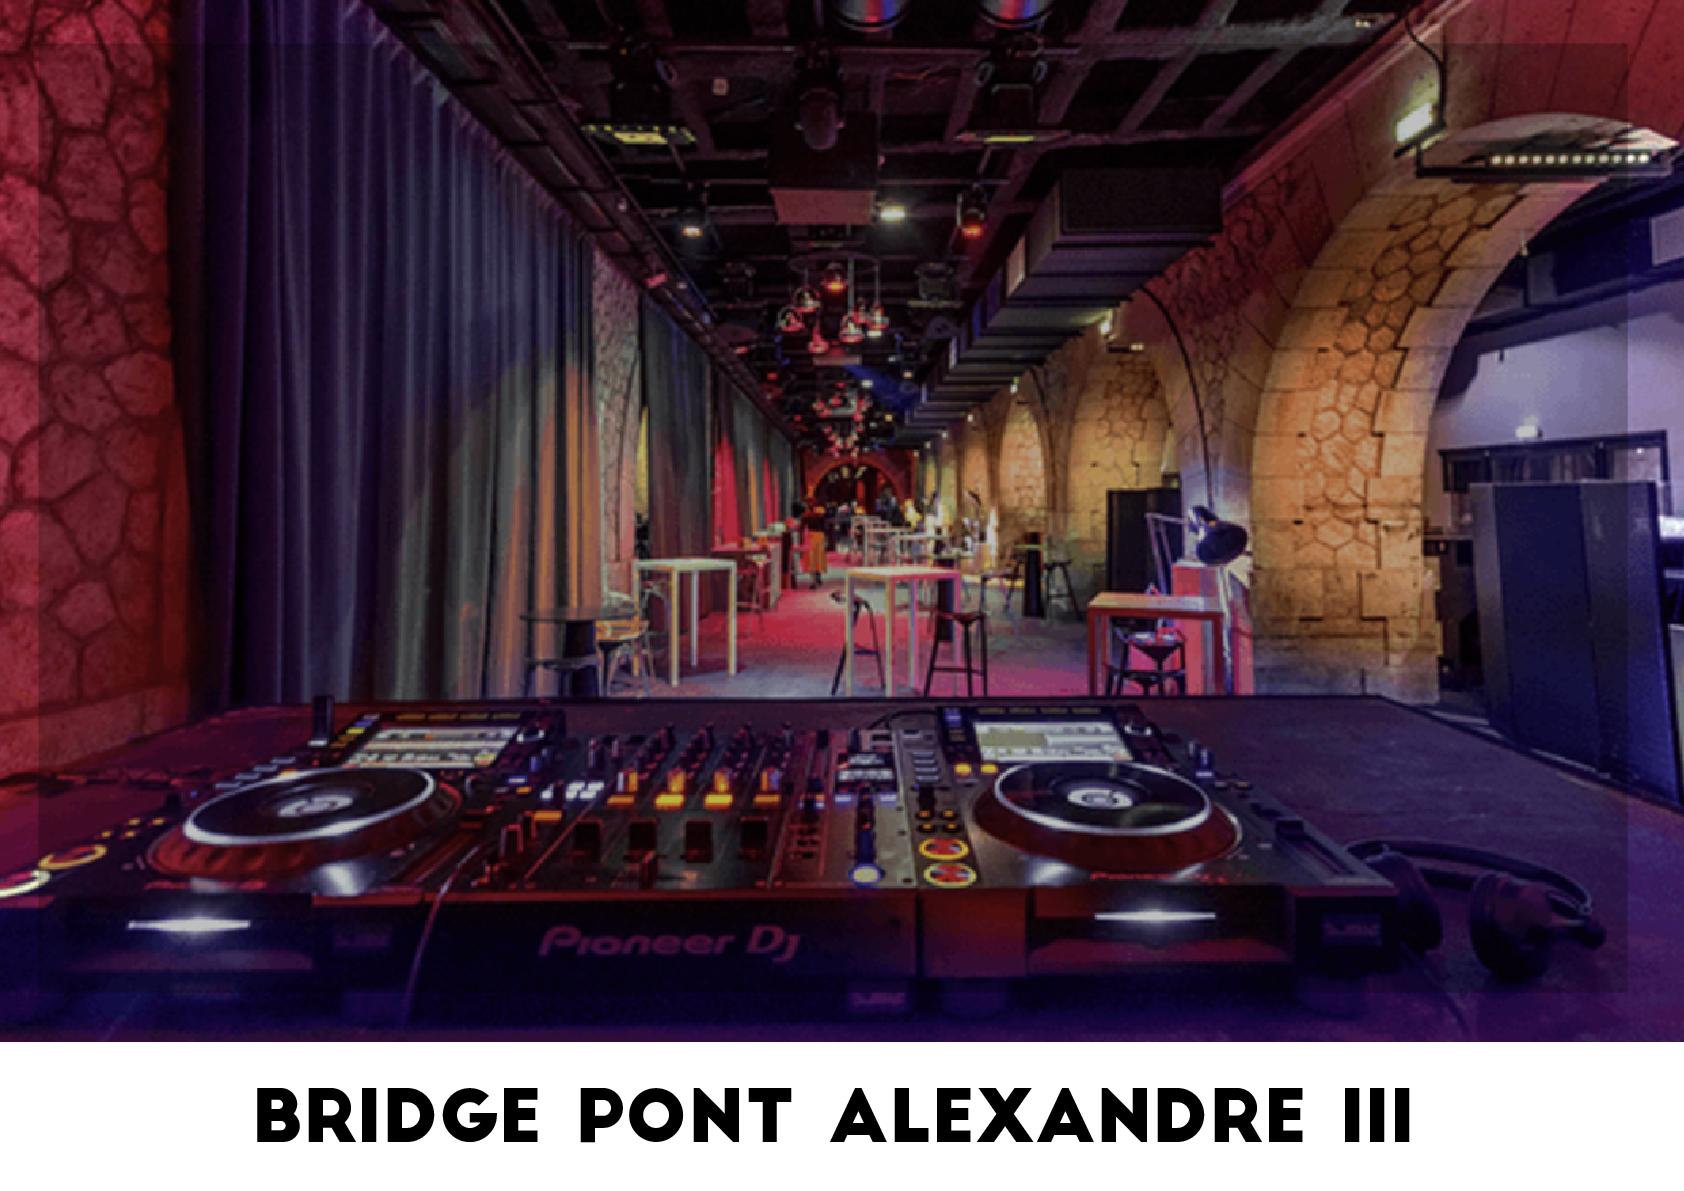 Lieu événementiel - Bridge Pont Alexandre III